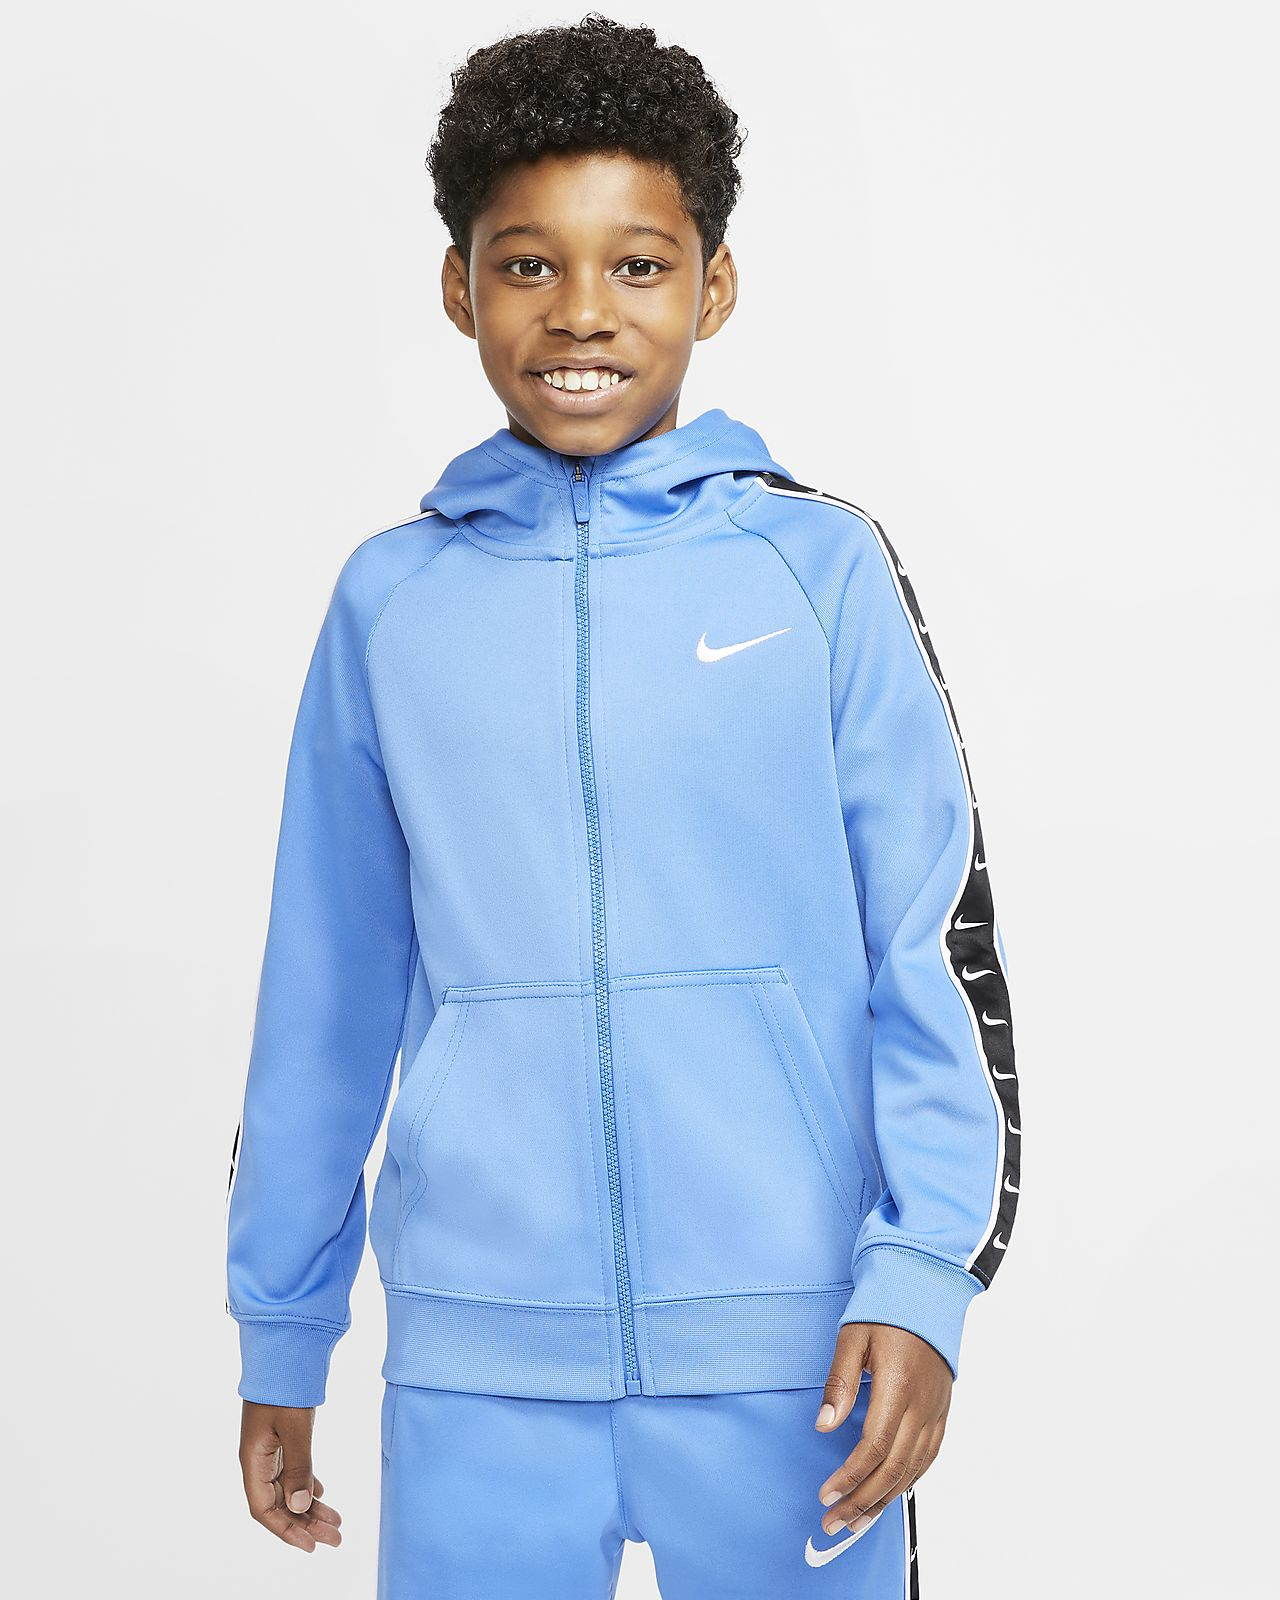 Худи с молнией во всю длину для мальчиков школьного возраста Nike Sportswear Swoosh